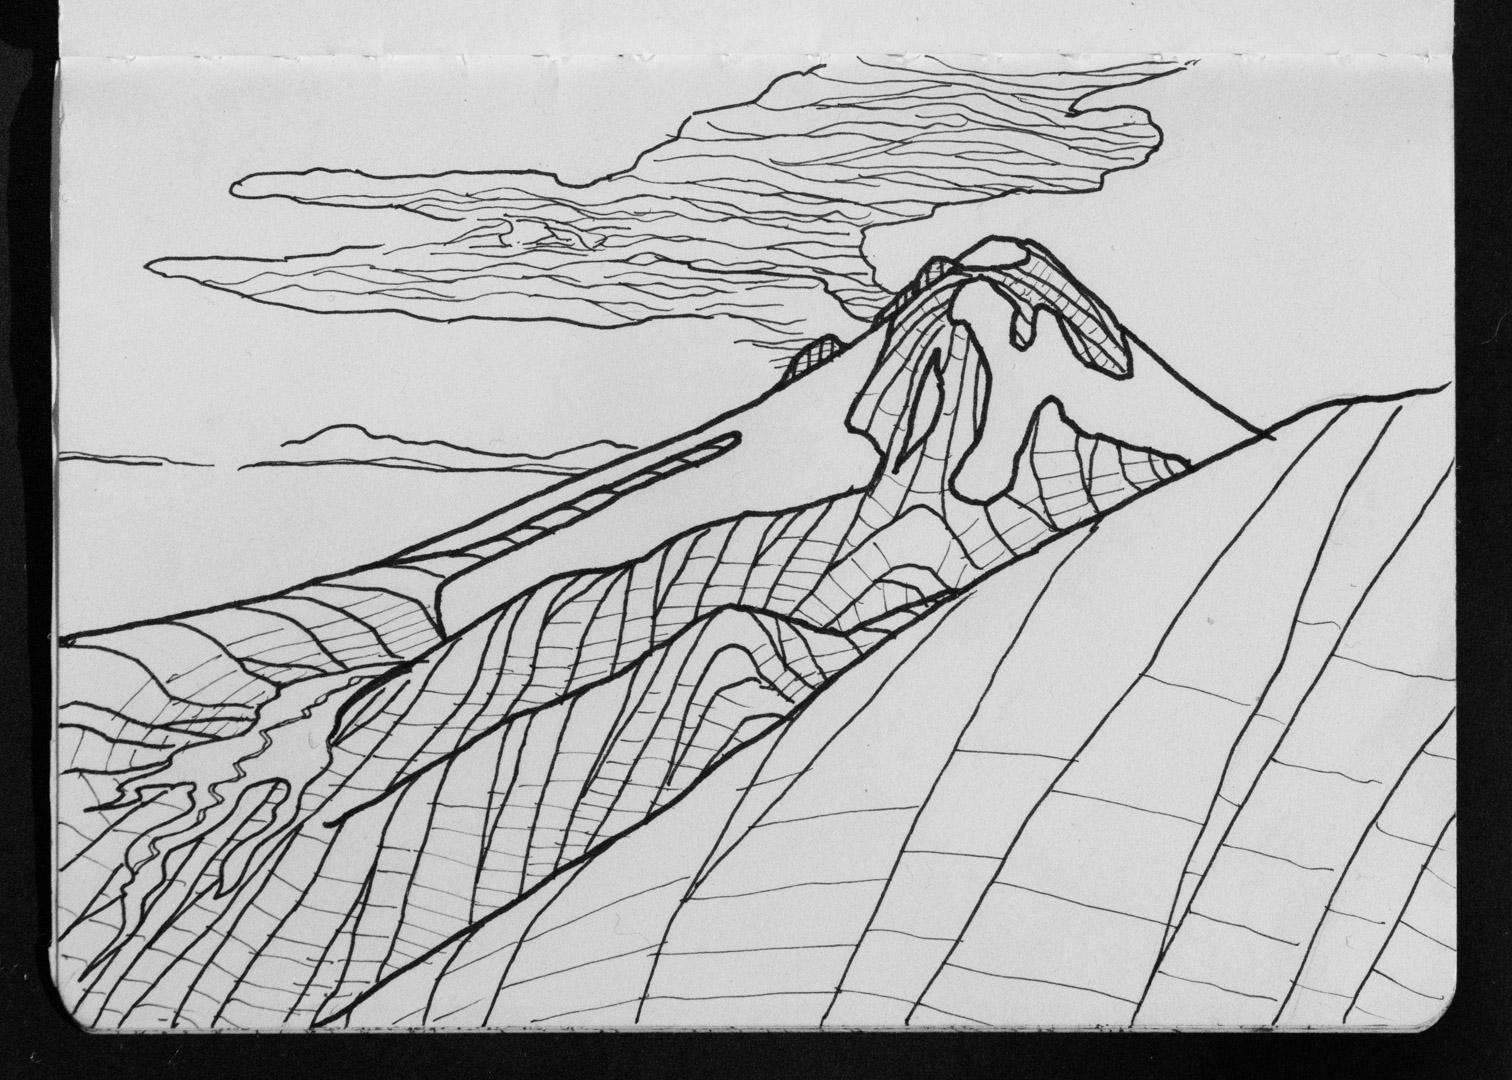 01-22 Mt Hood from Bonnie Butte.jpg